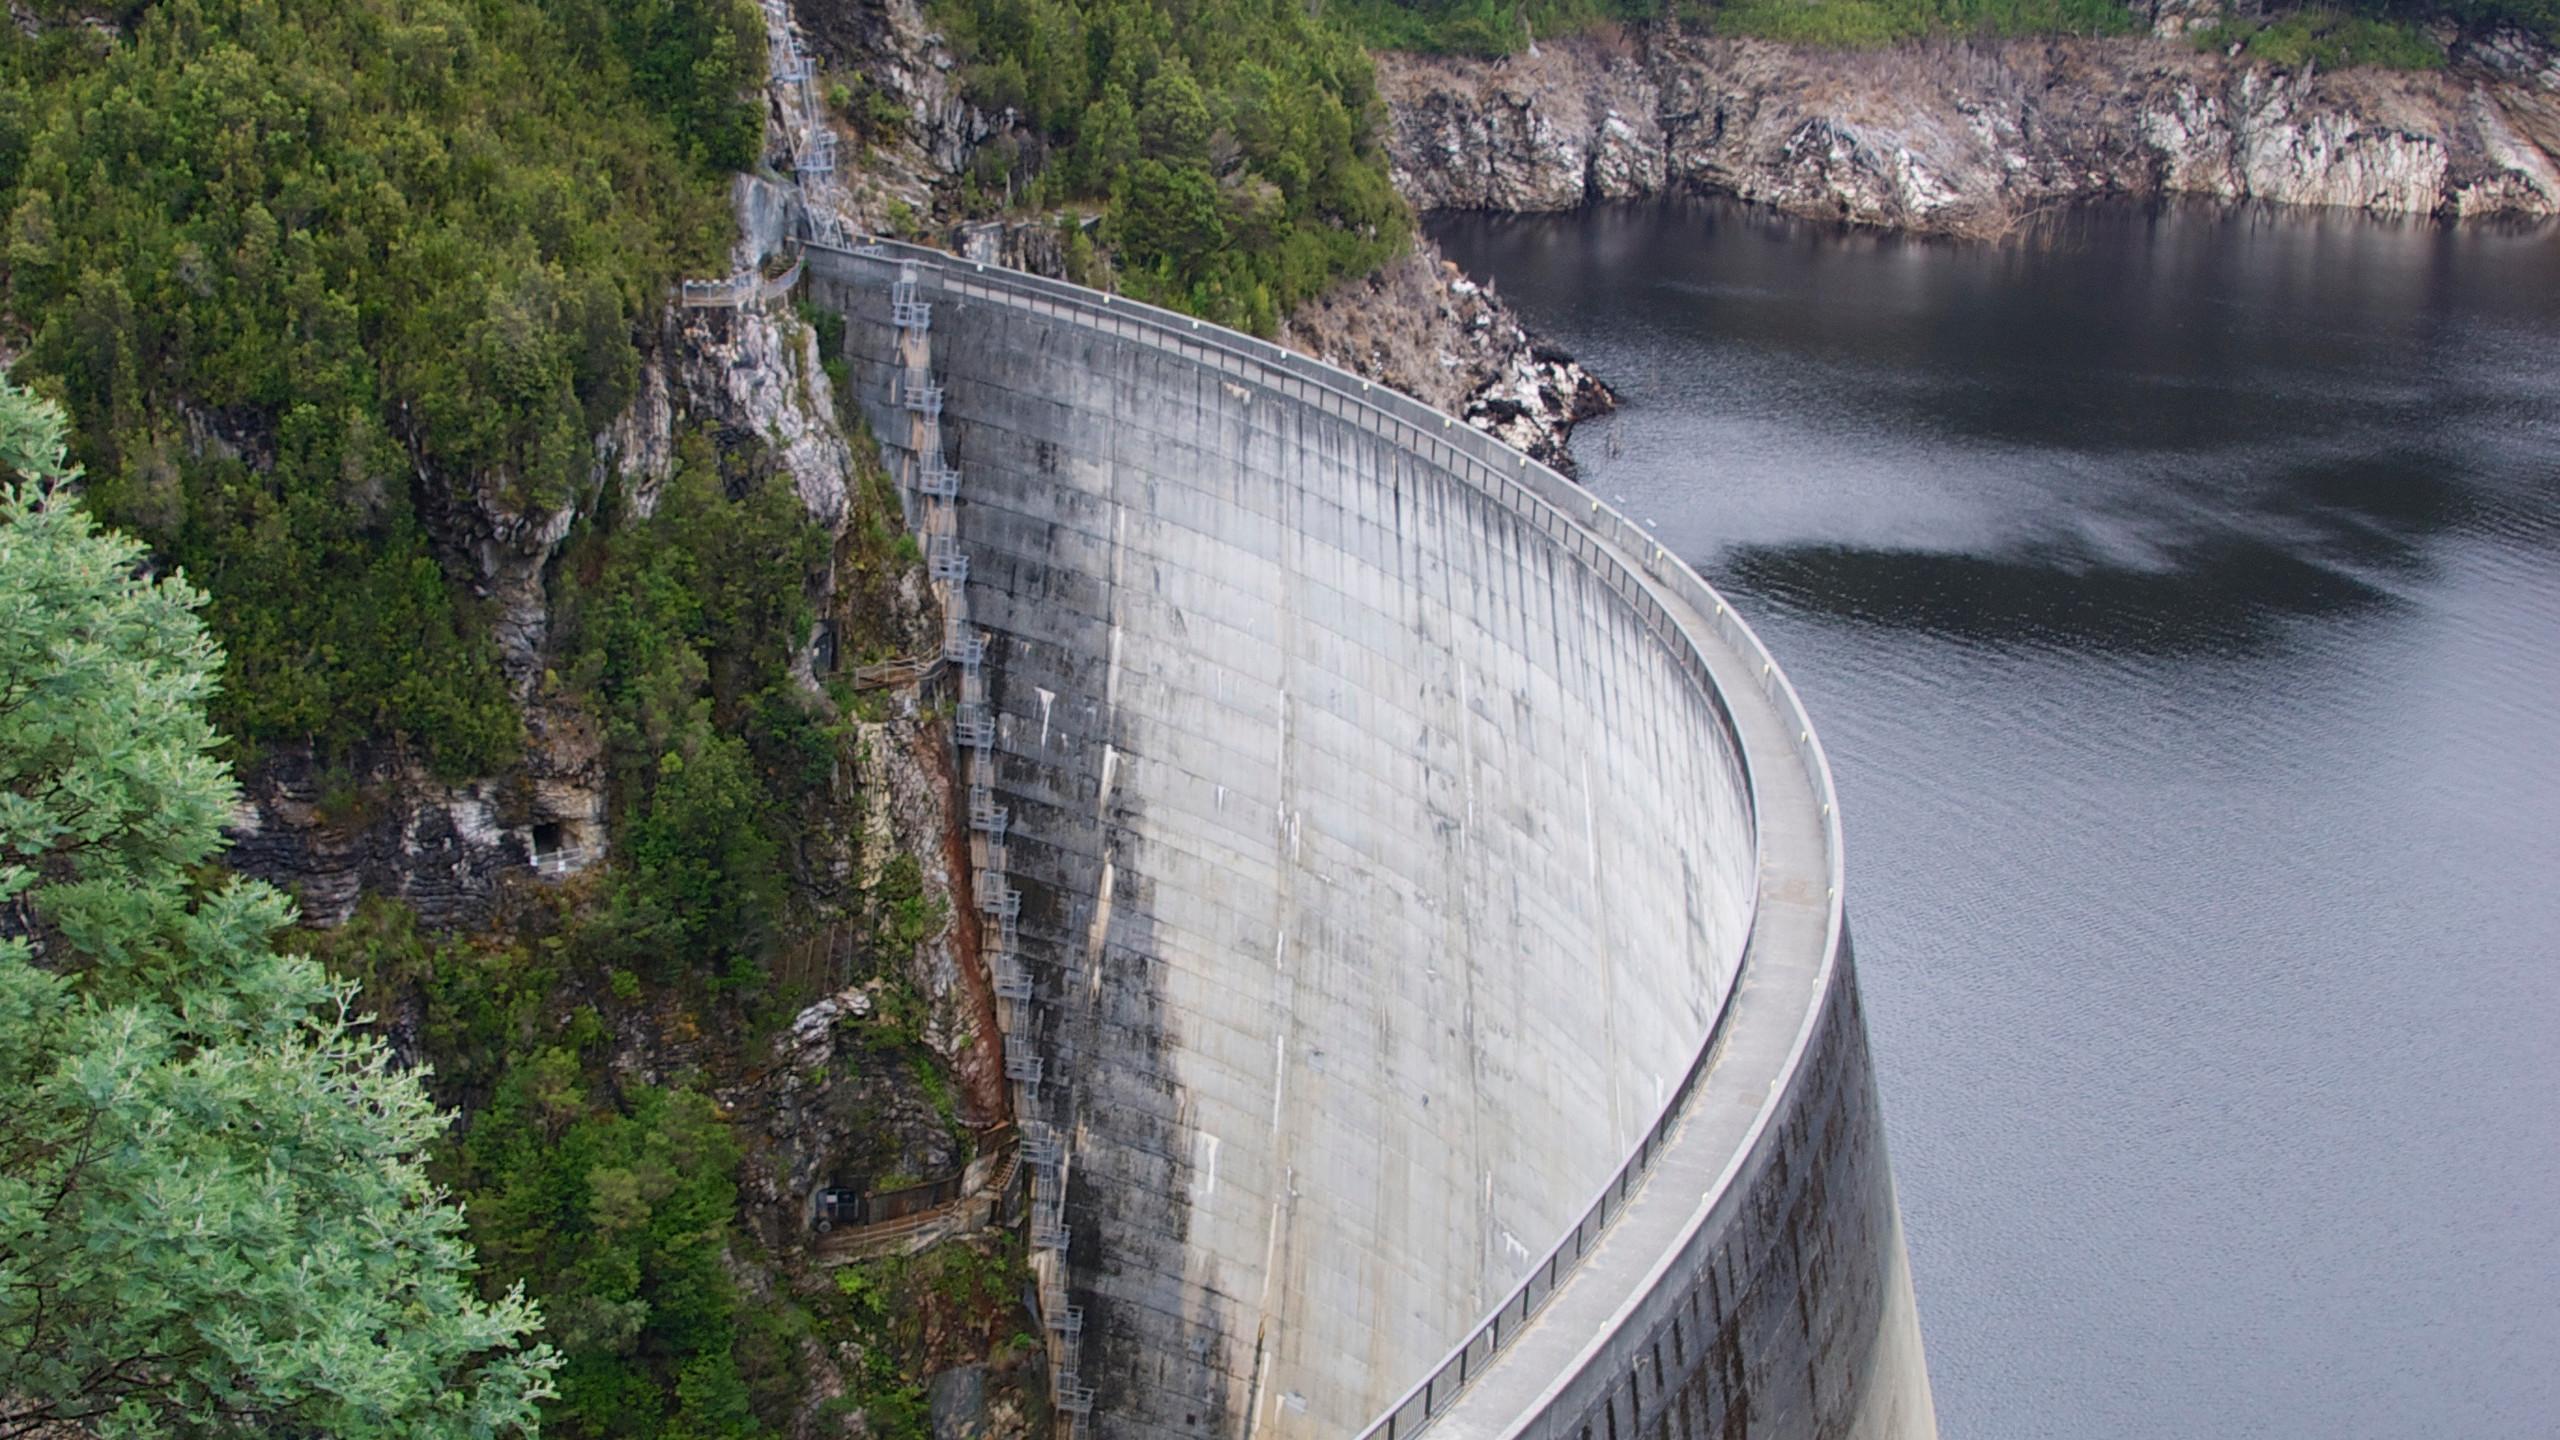 Strathgordon Dam